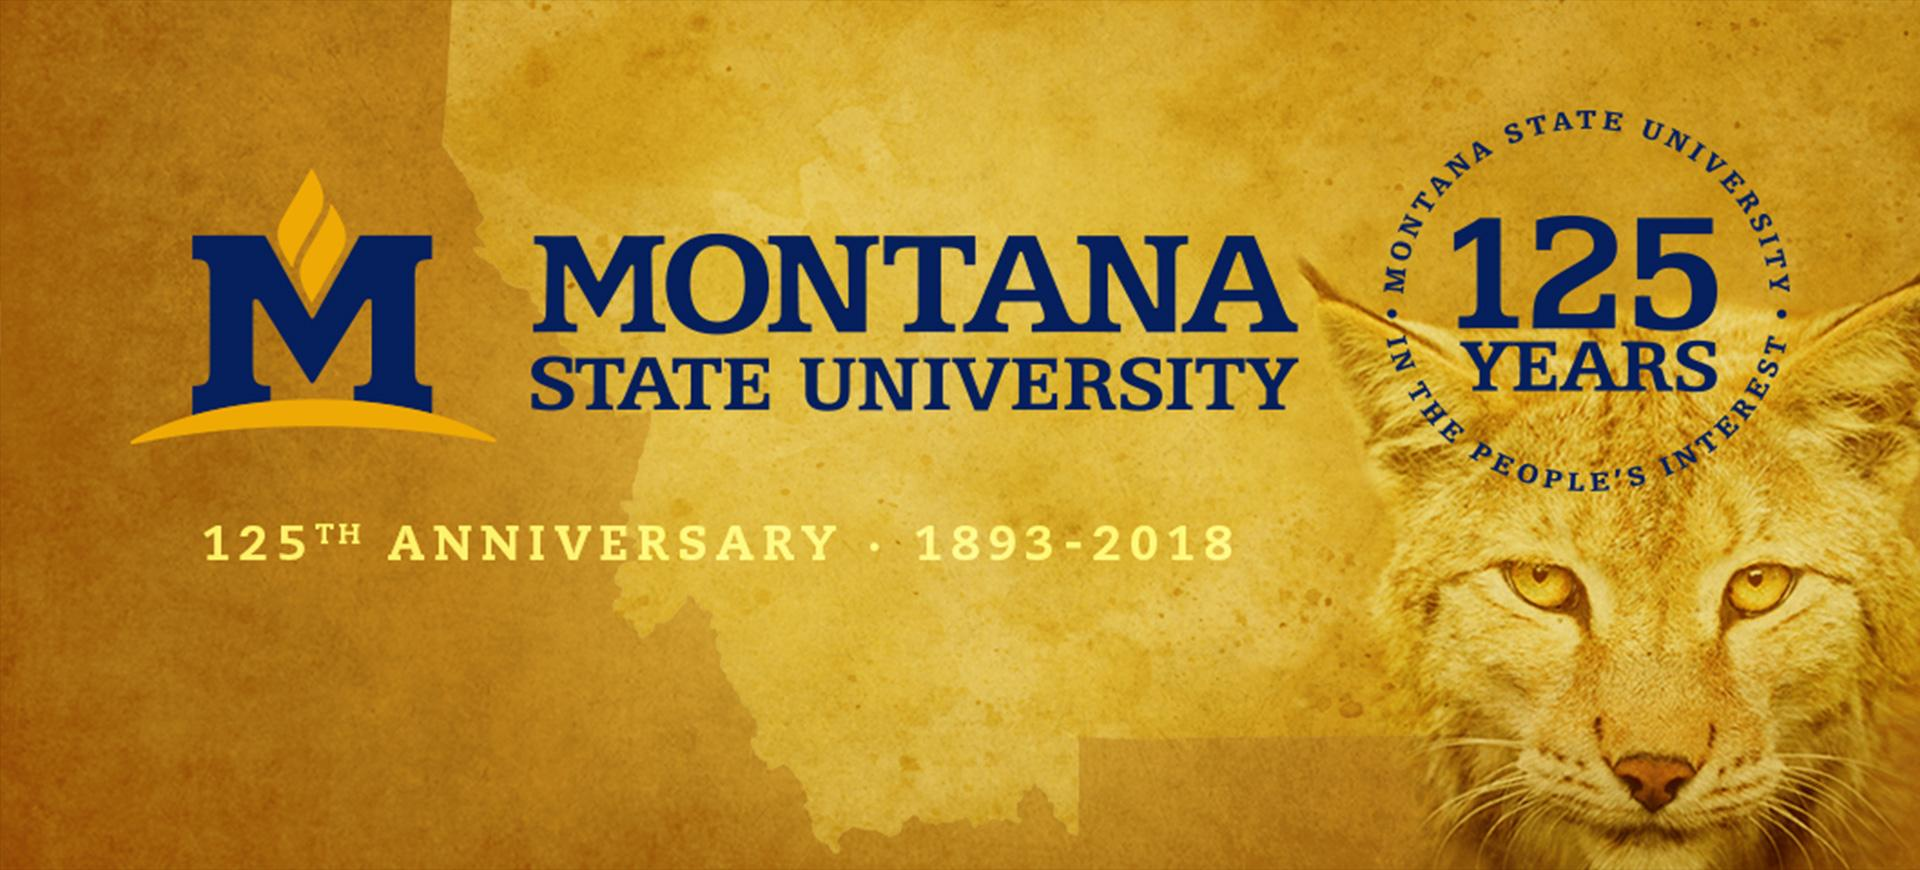 Montana State University celebrates its 125th Anniversary in 2018